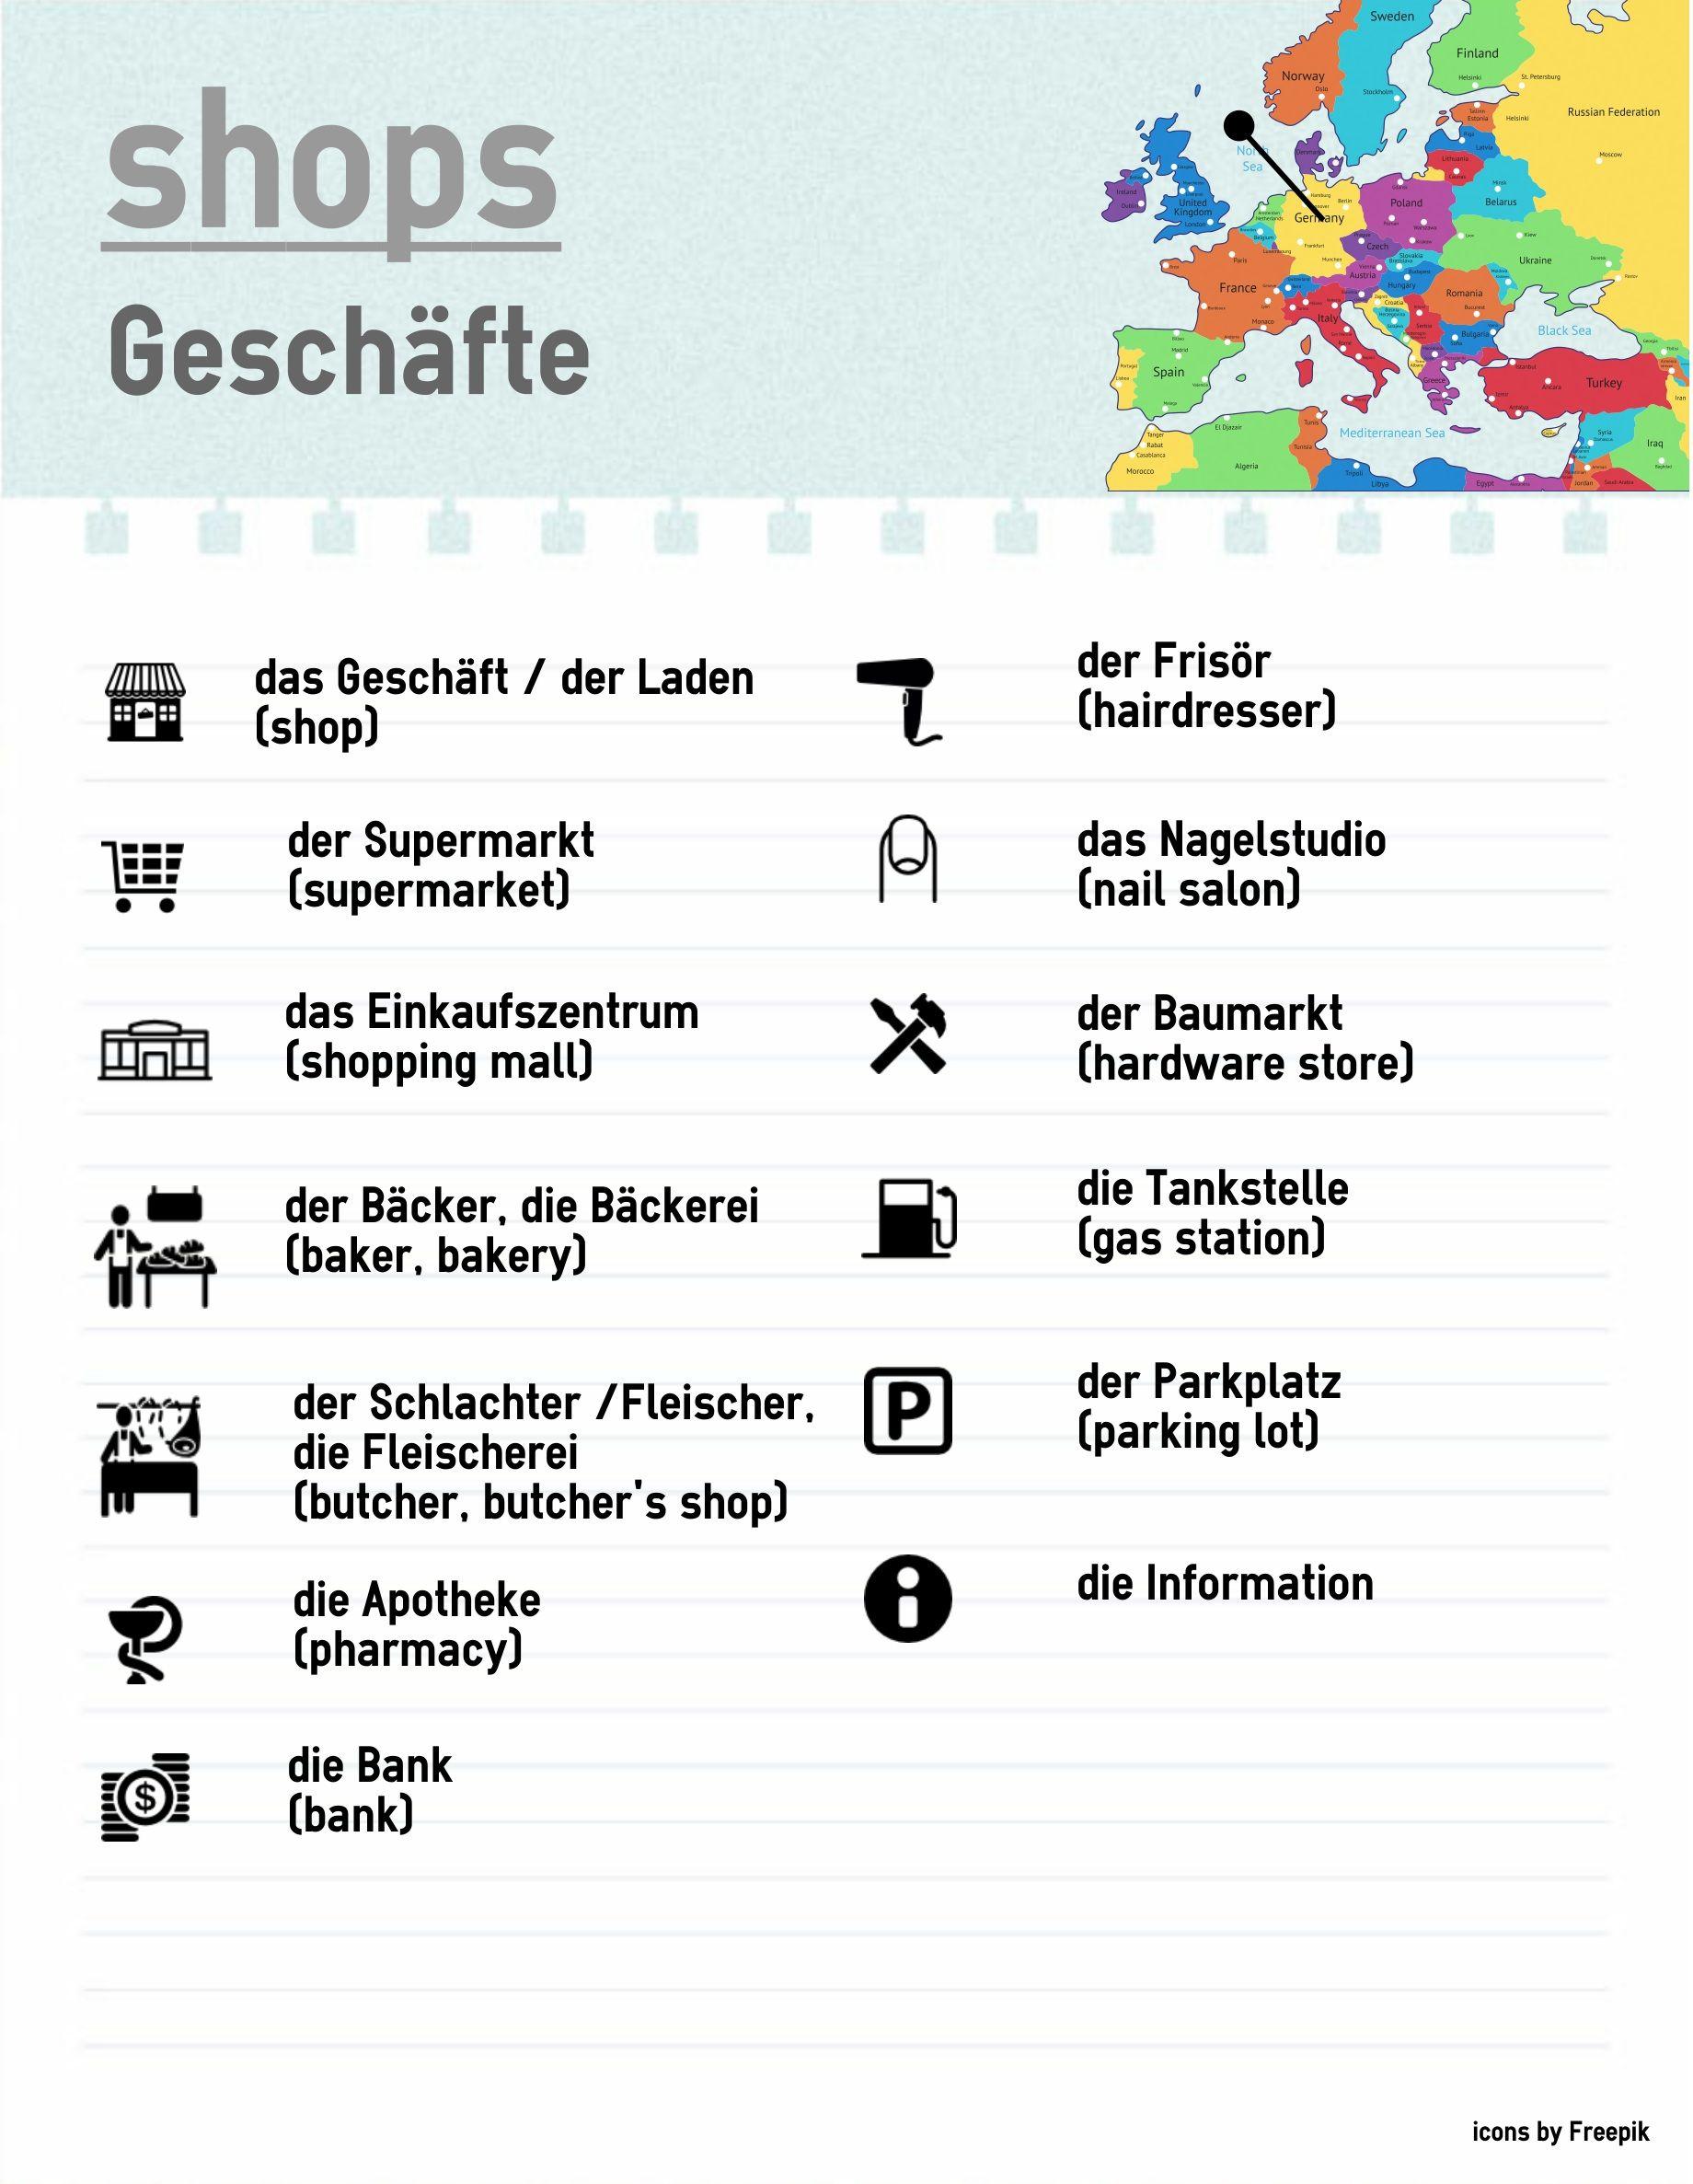 http://www.my-german-course.com/wp-content/uploads/2015/09/german-vocabulary-shops.jpg